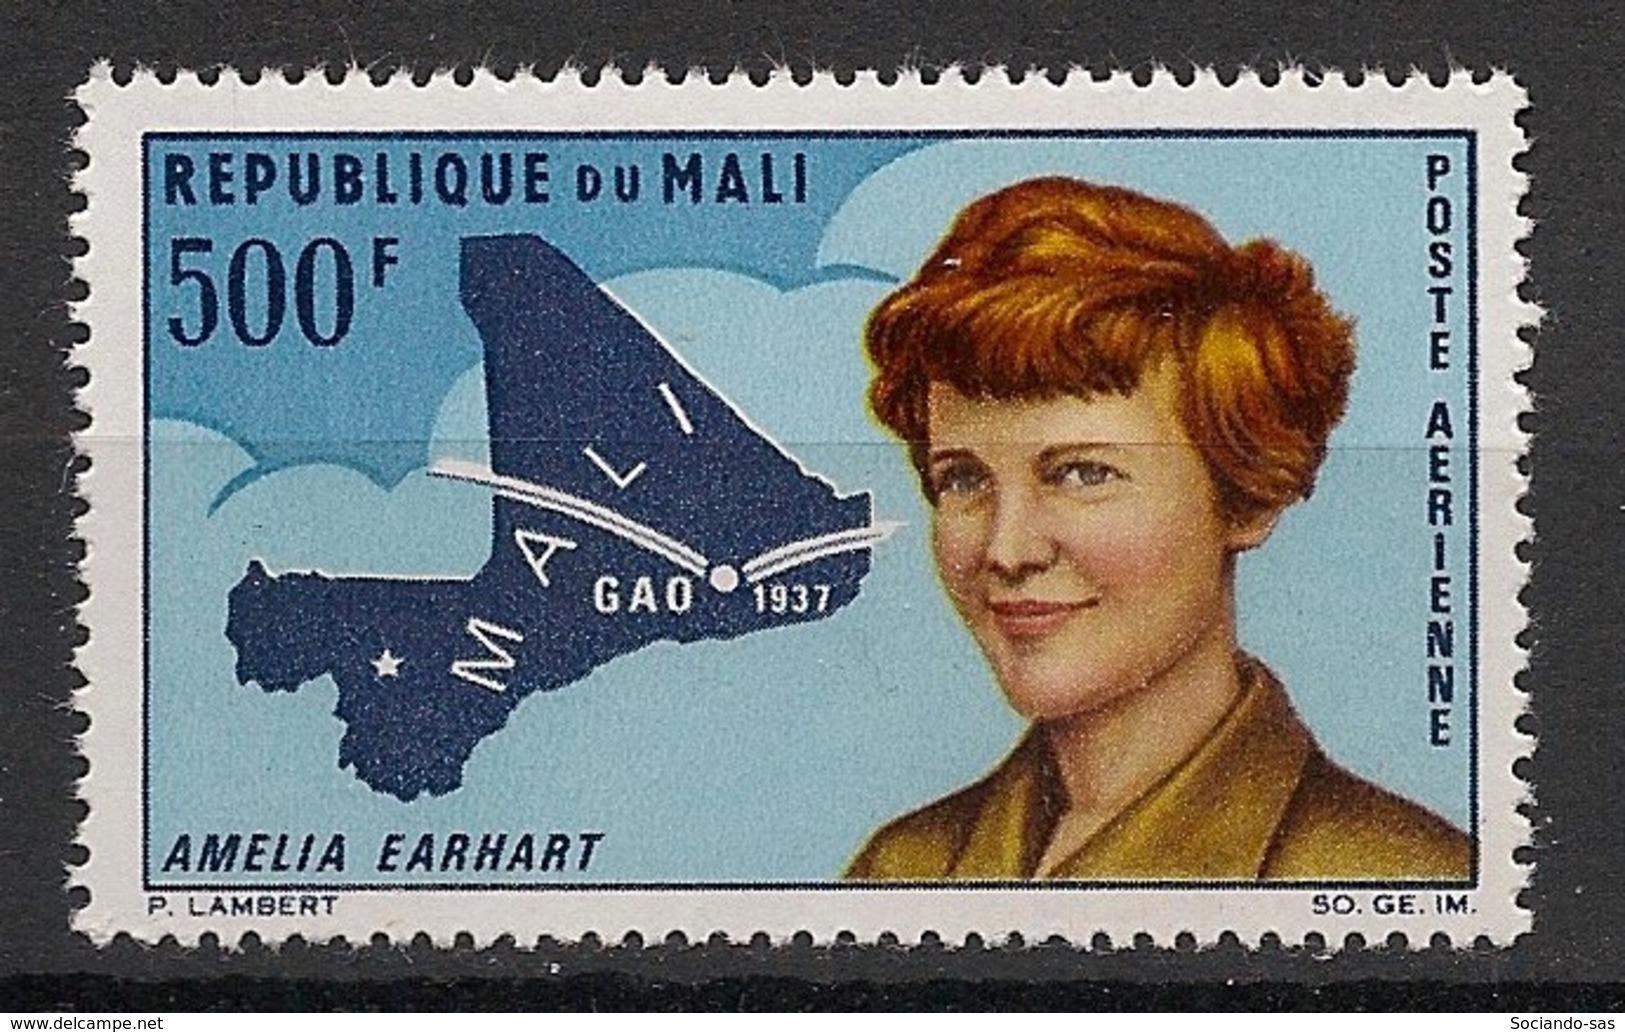 Mali - 1967 - Poste Aérienne PA N°Yv. 45 - Amelia Earhart - Neuf Luxe ** / MNH / Postfrisch - Mali (1959-...)